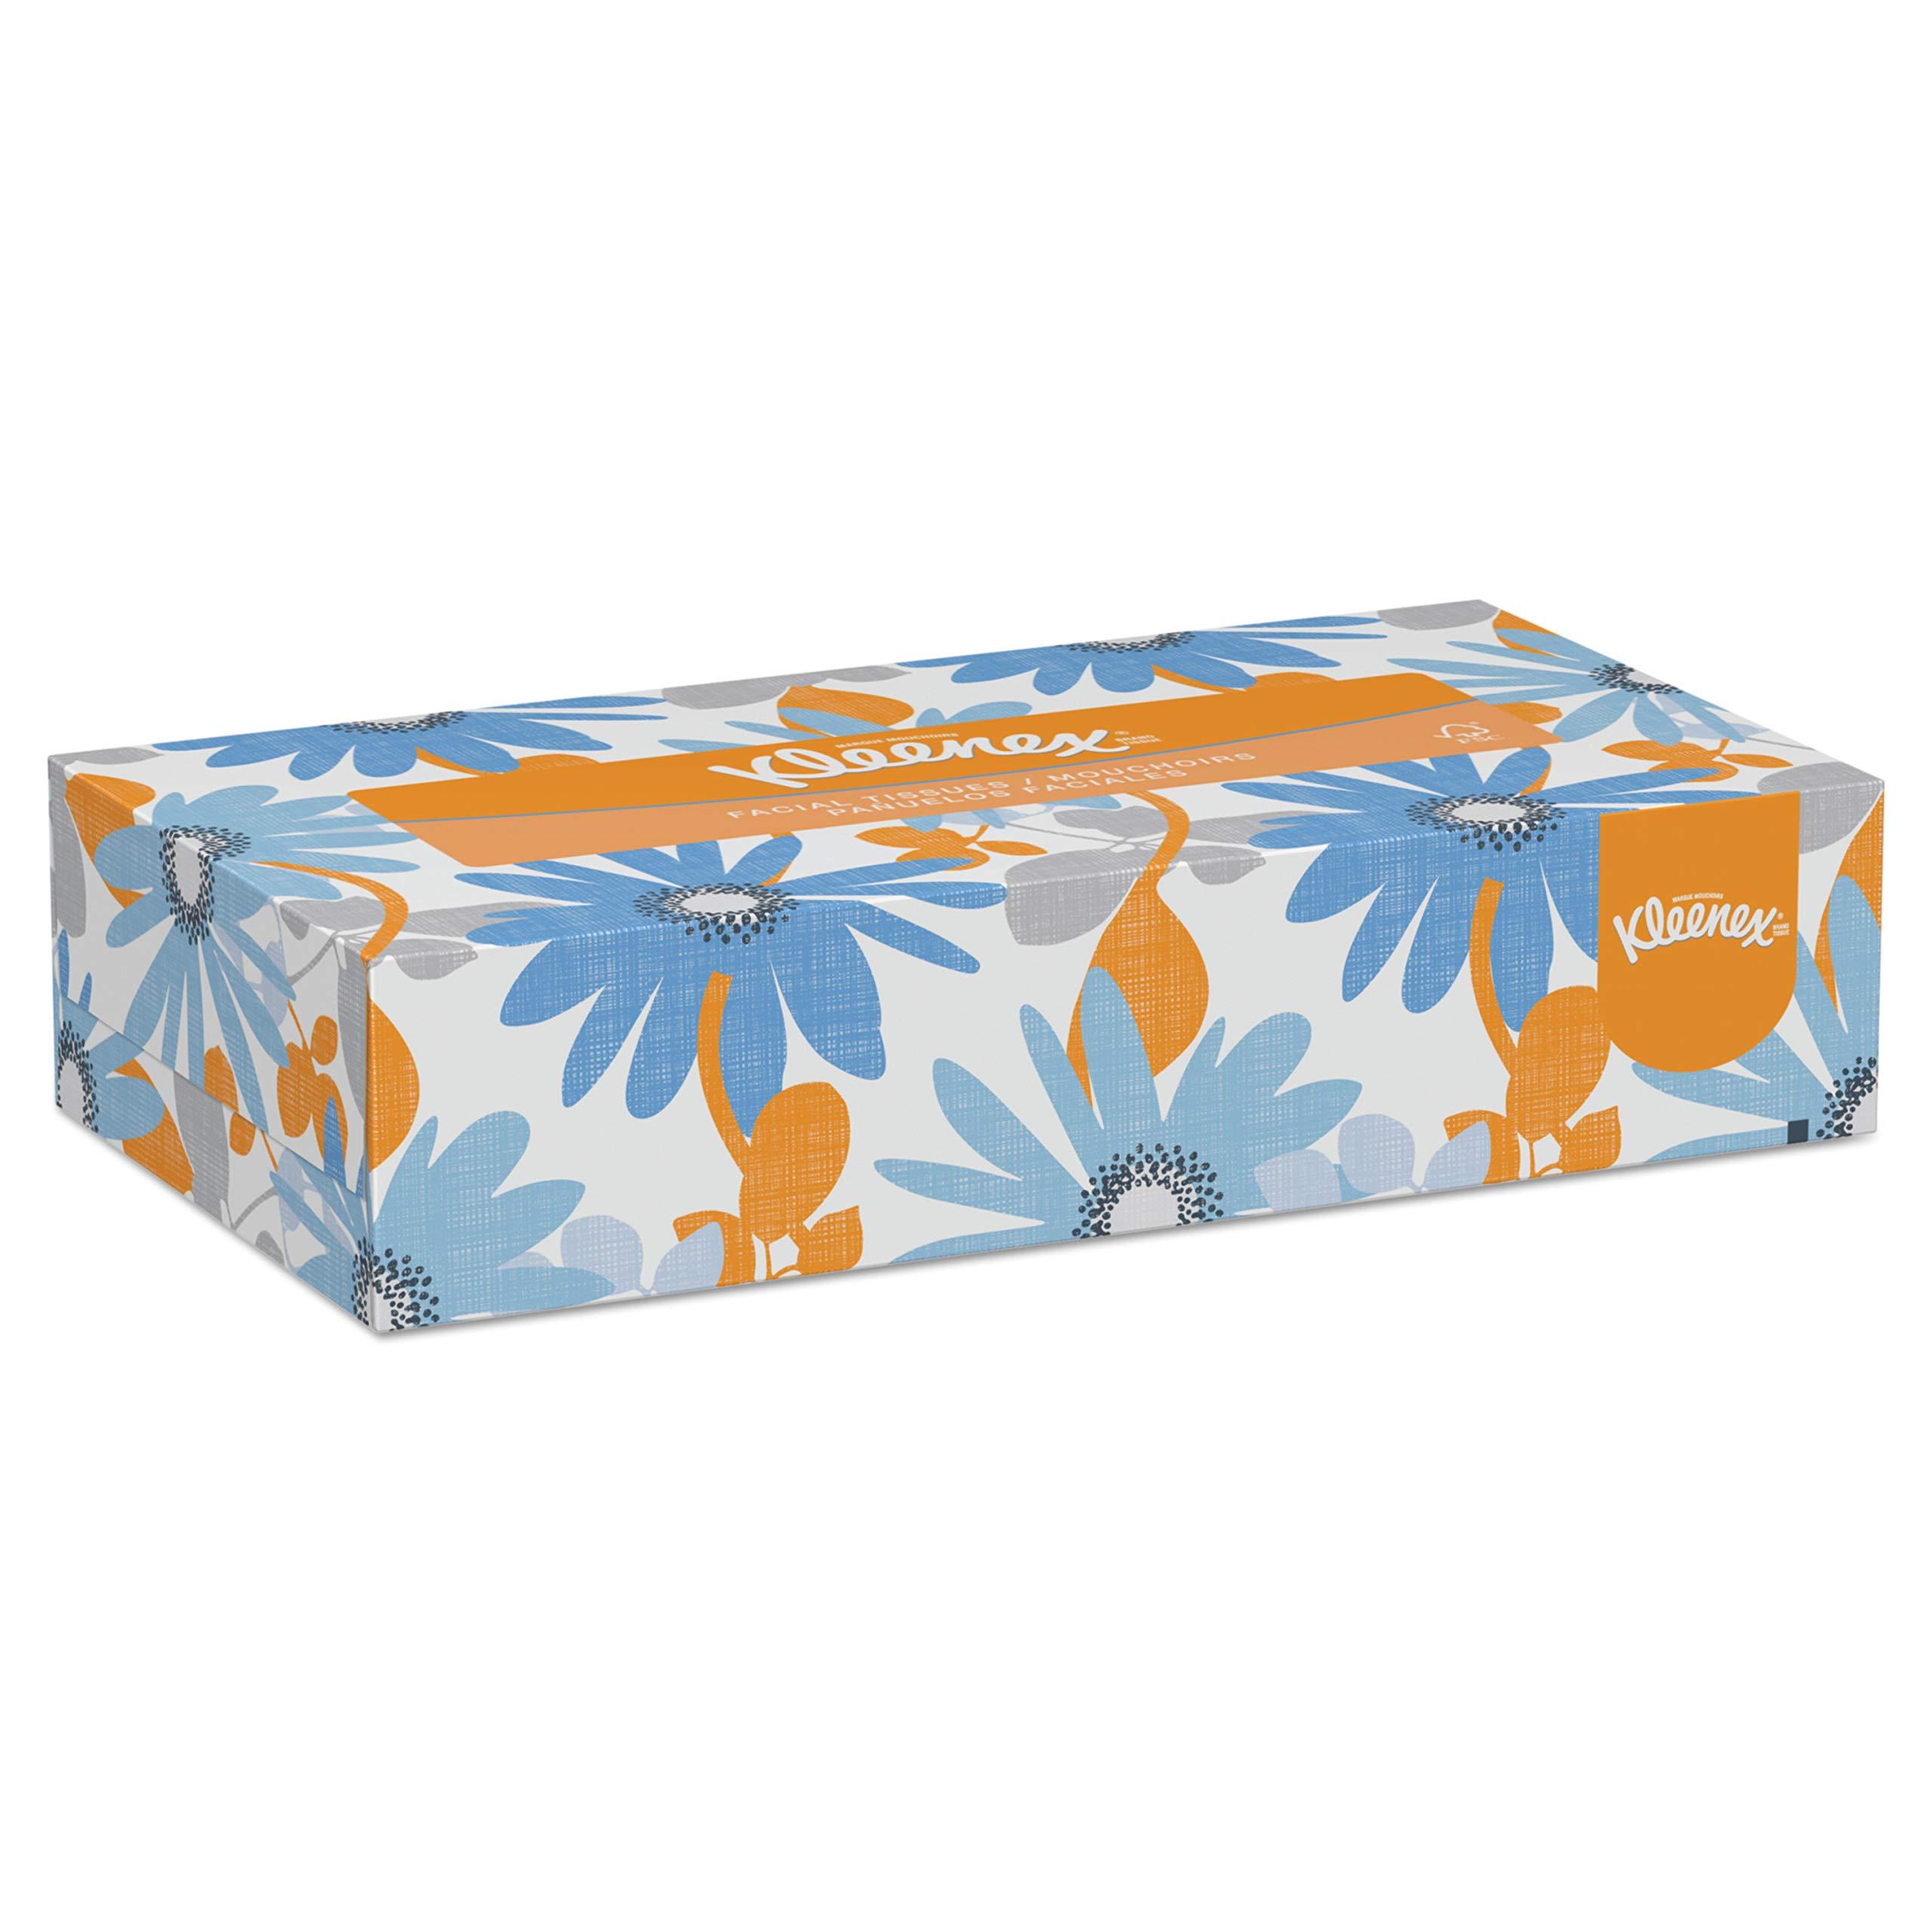 Kleenex 21400 White Facial Tissue, 2-Ply, Pop-Up Box, 100 per Box (Case of 36 Boxes)